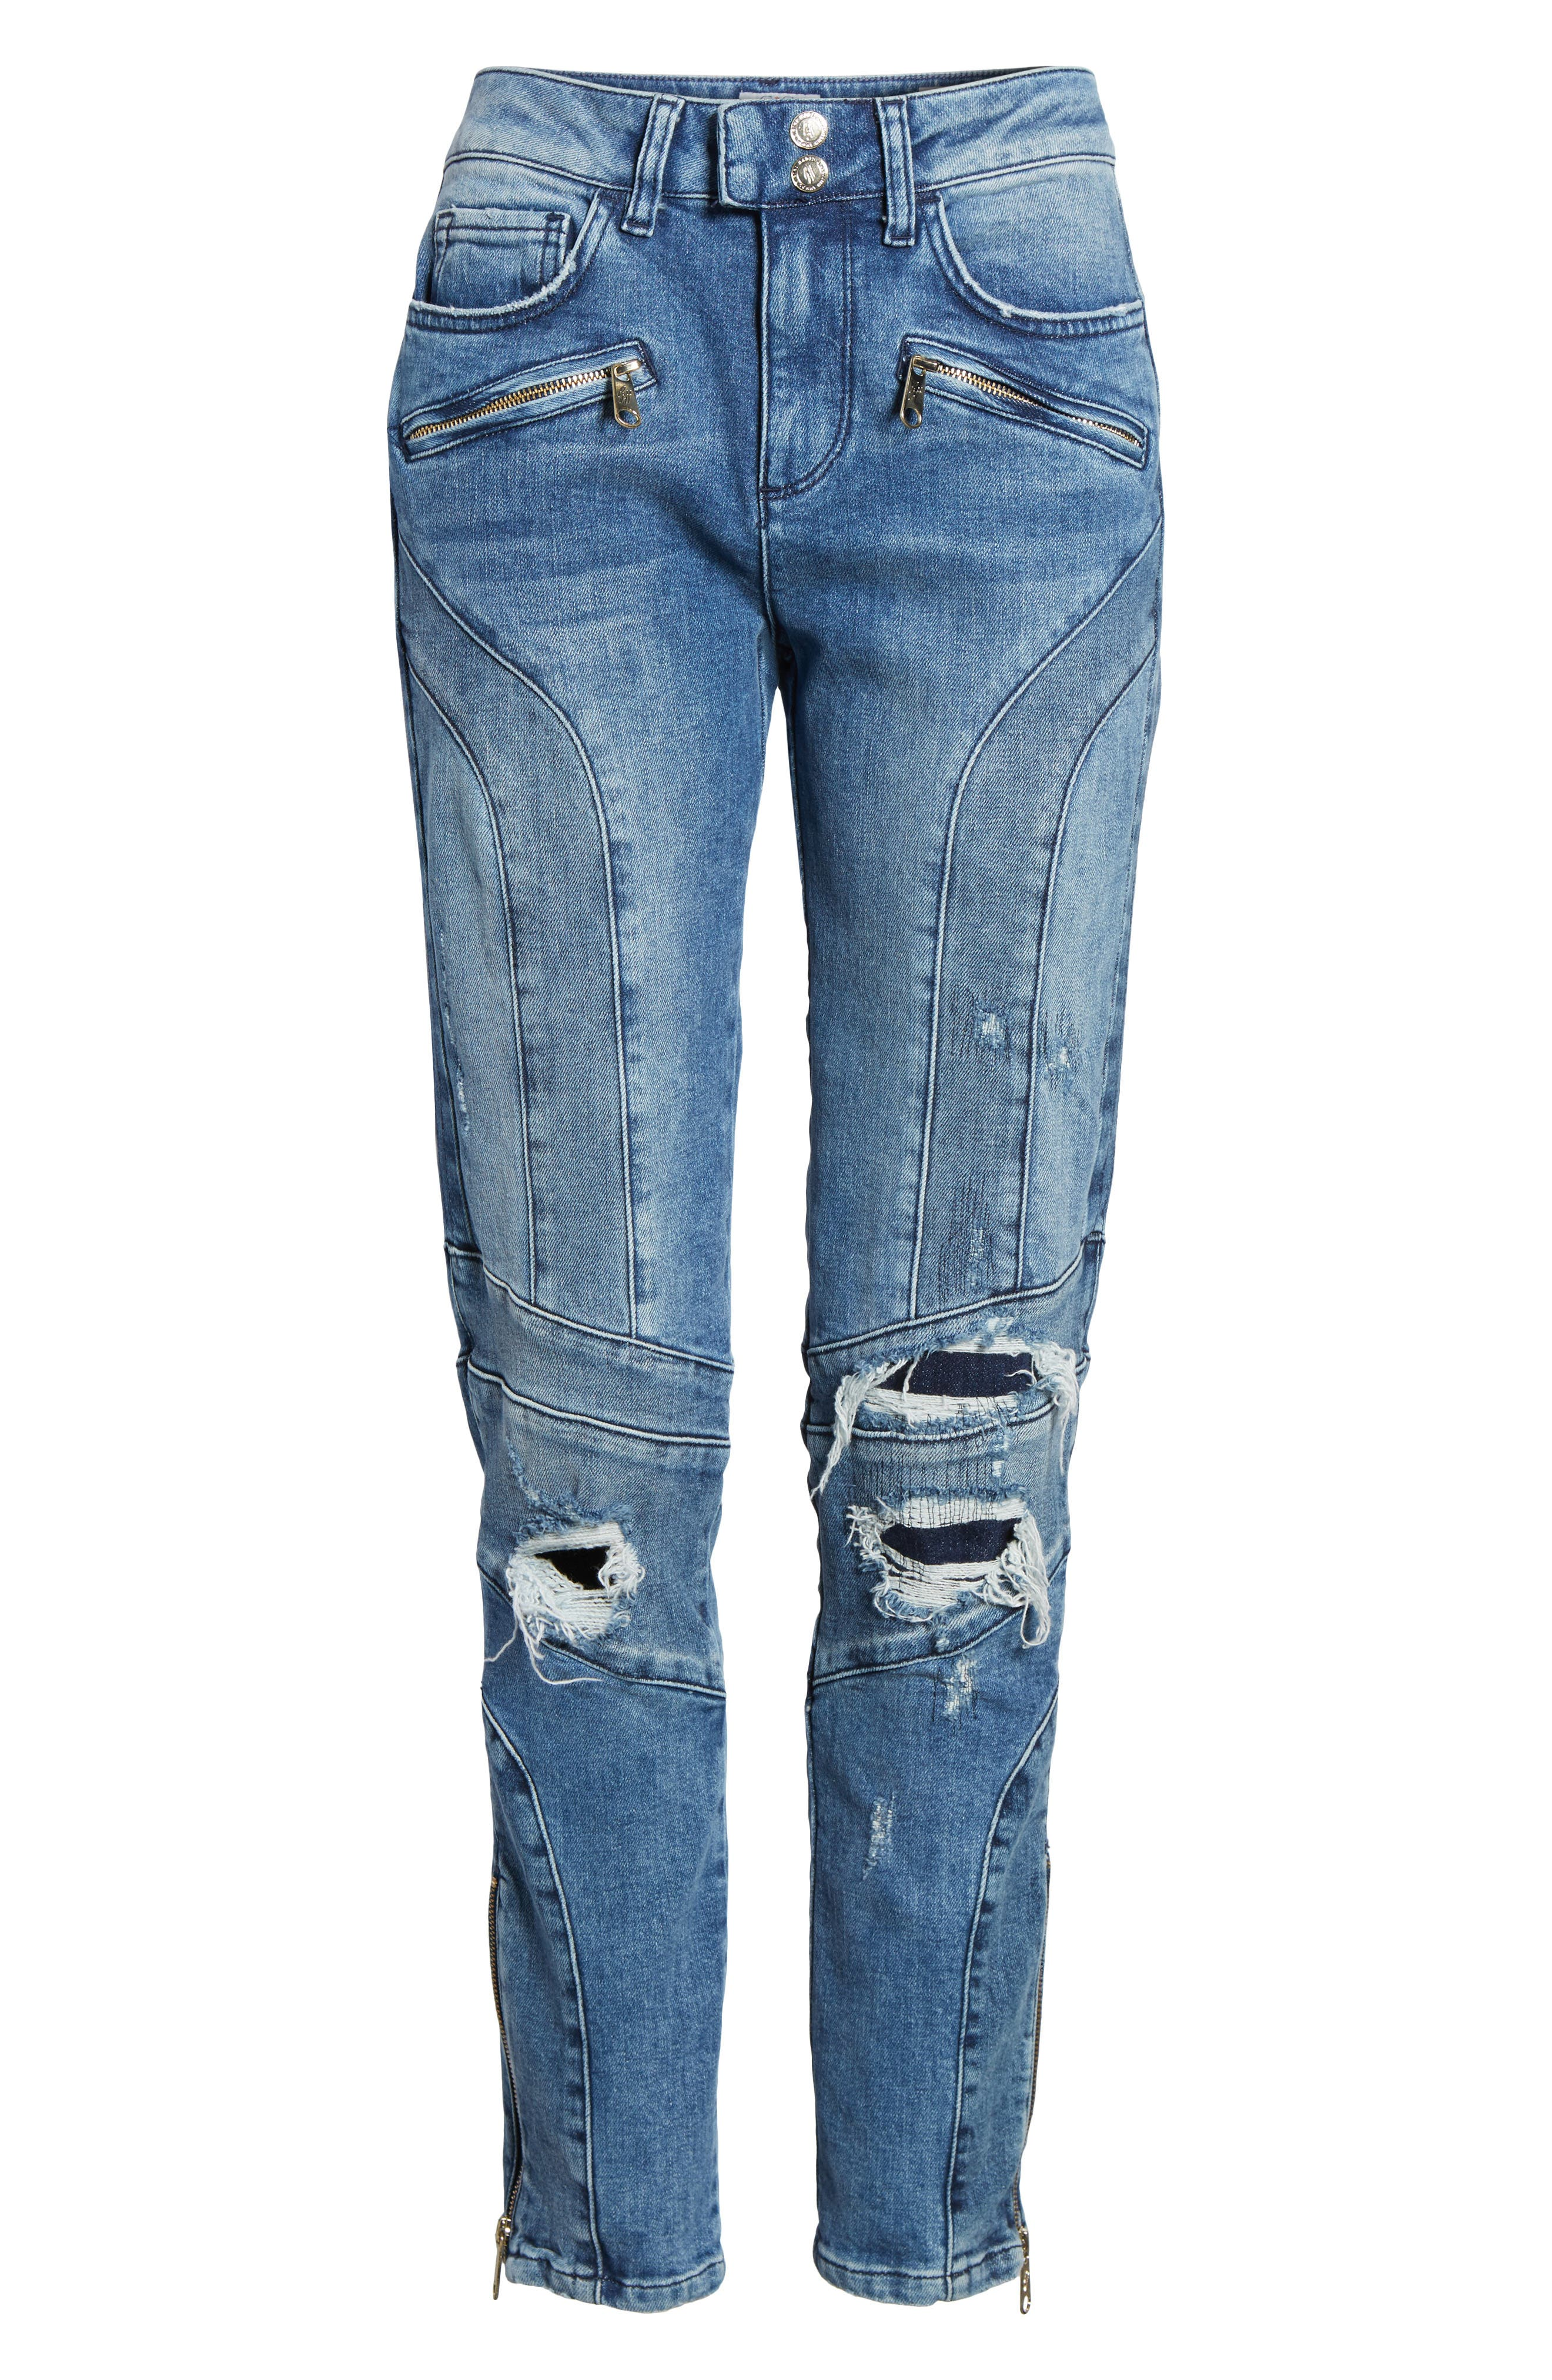 x Gigi Hadid Speed Distressed Ankle Zip Jeans,                             Alternate thumbnail 6, color,                             400